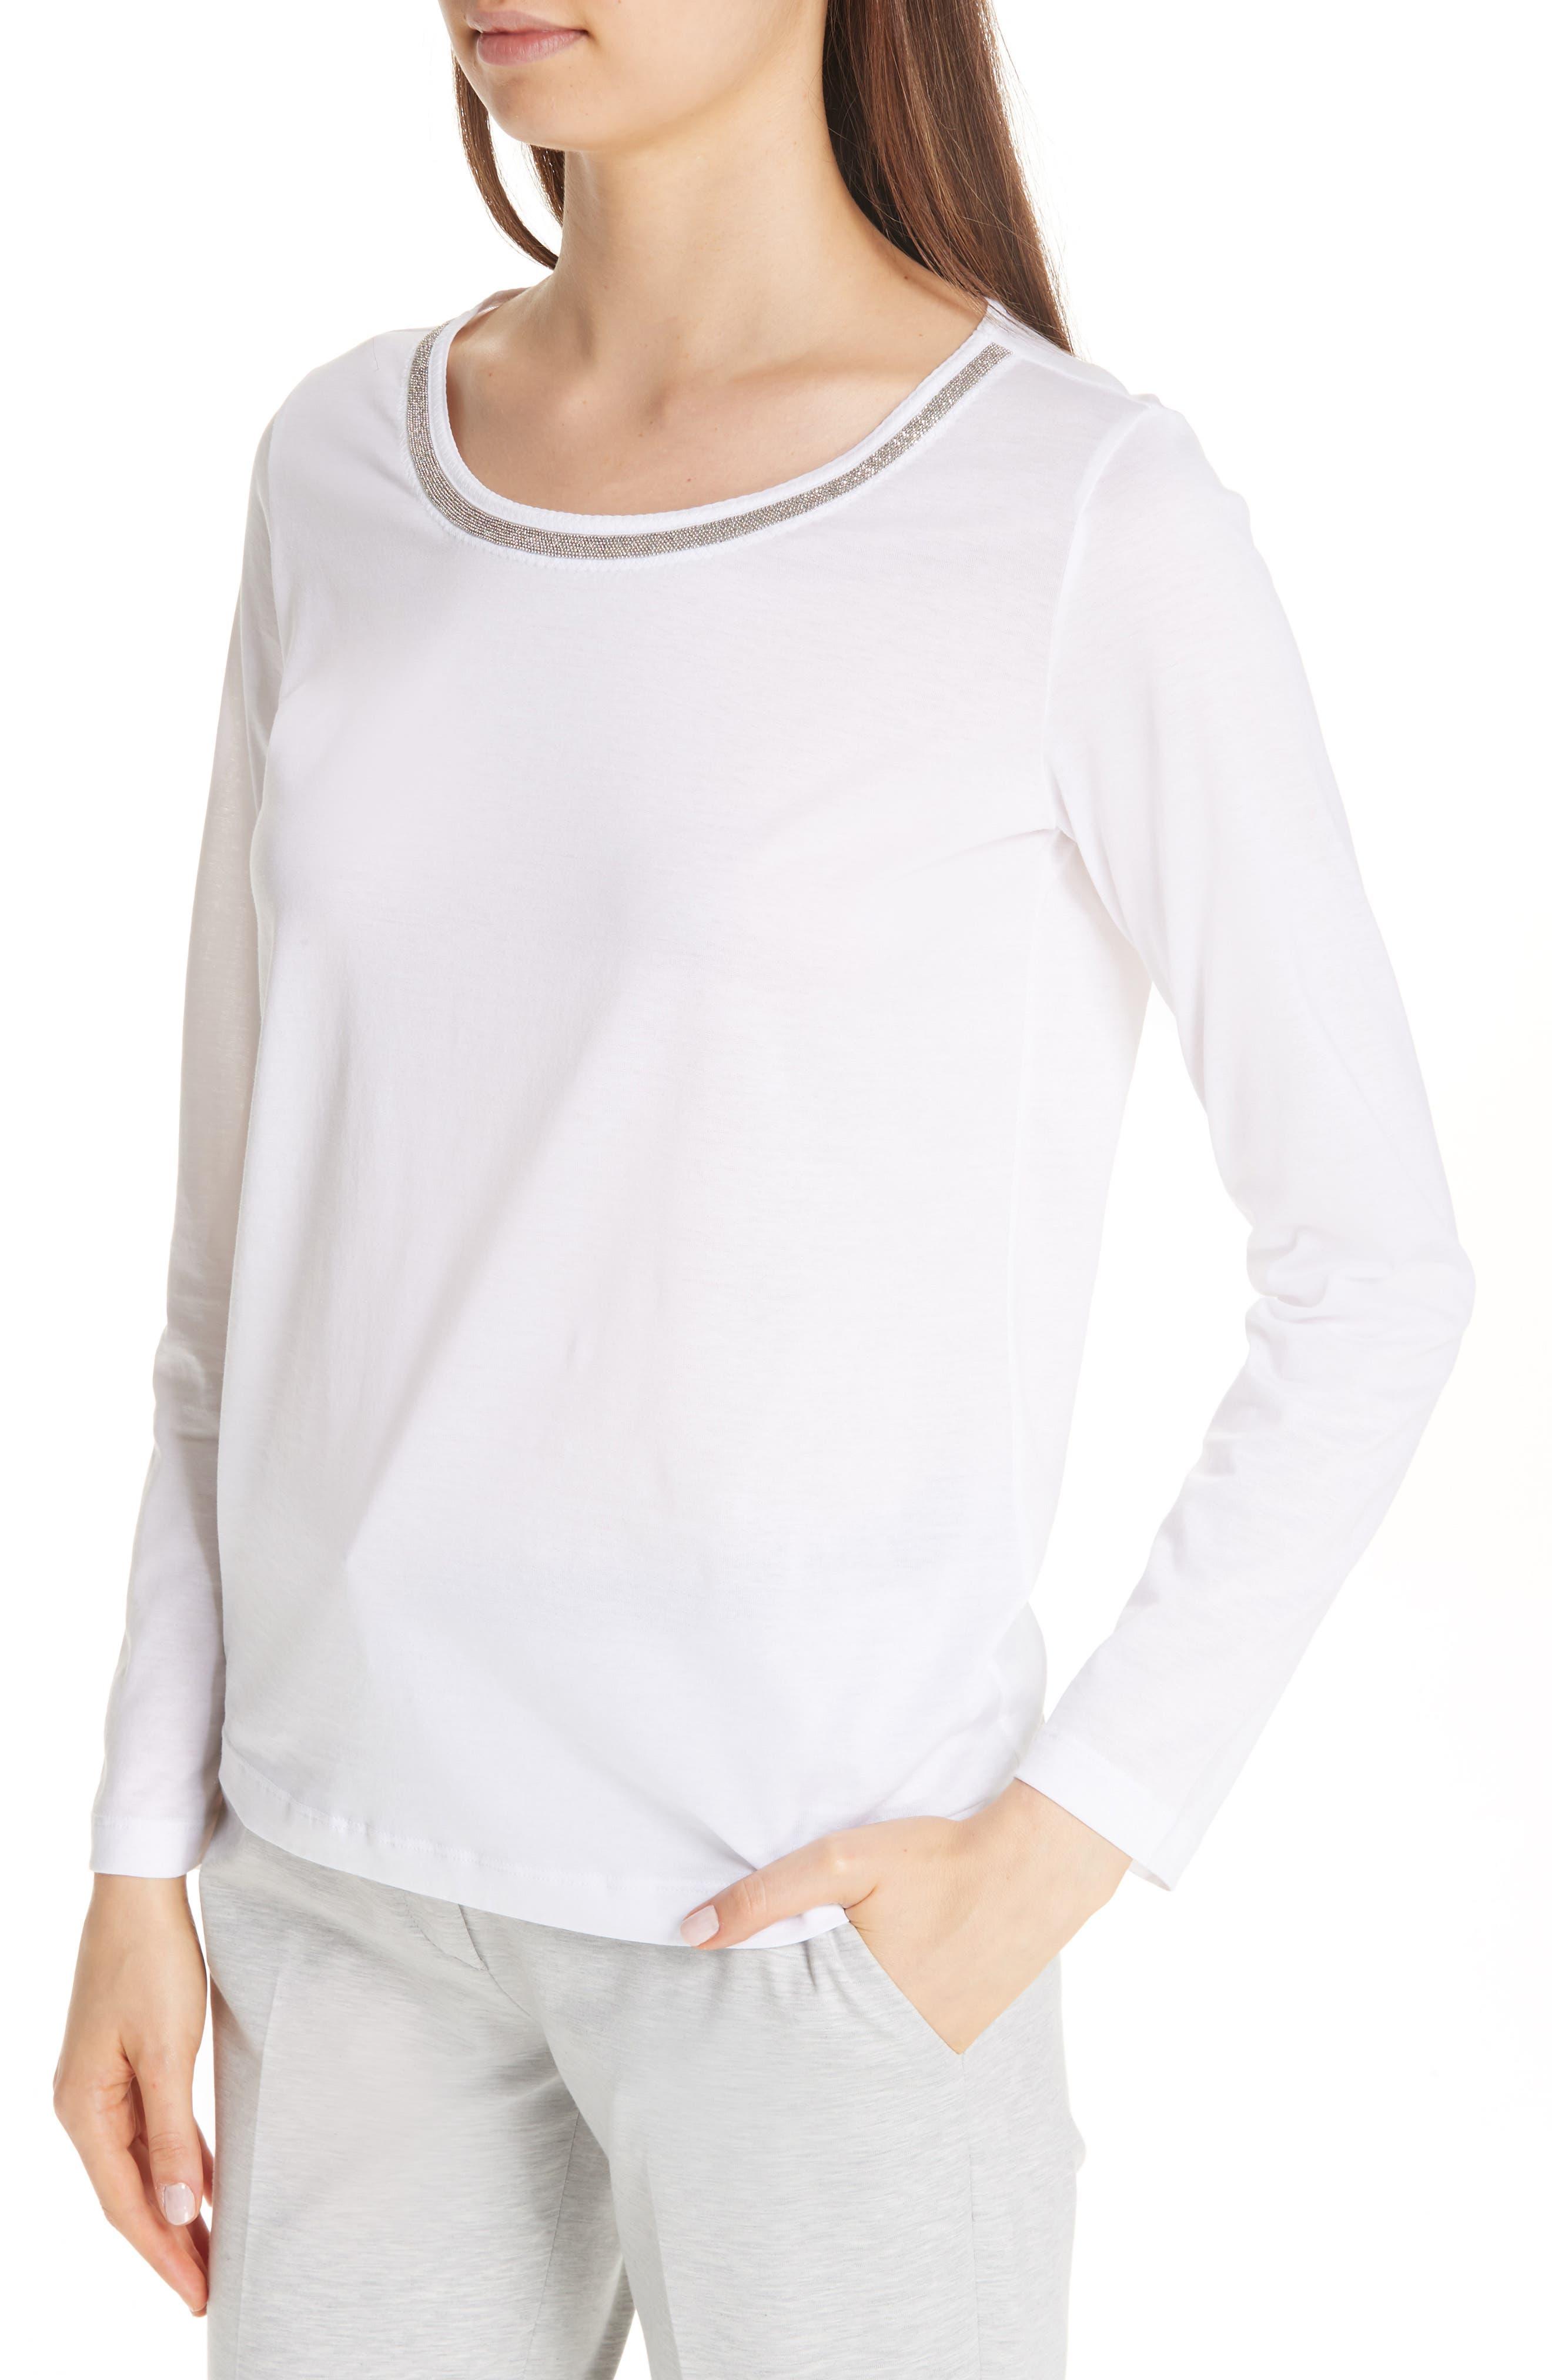 FABIANA FILIPPI, Chain Trim Jersey Top, Alternate thumbnail 4, color, WHITE